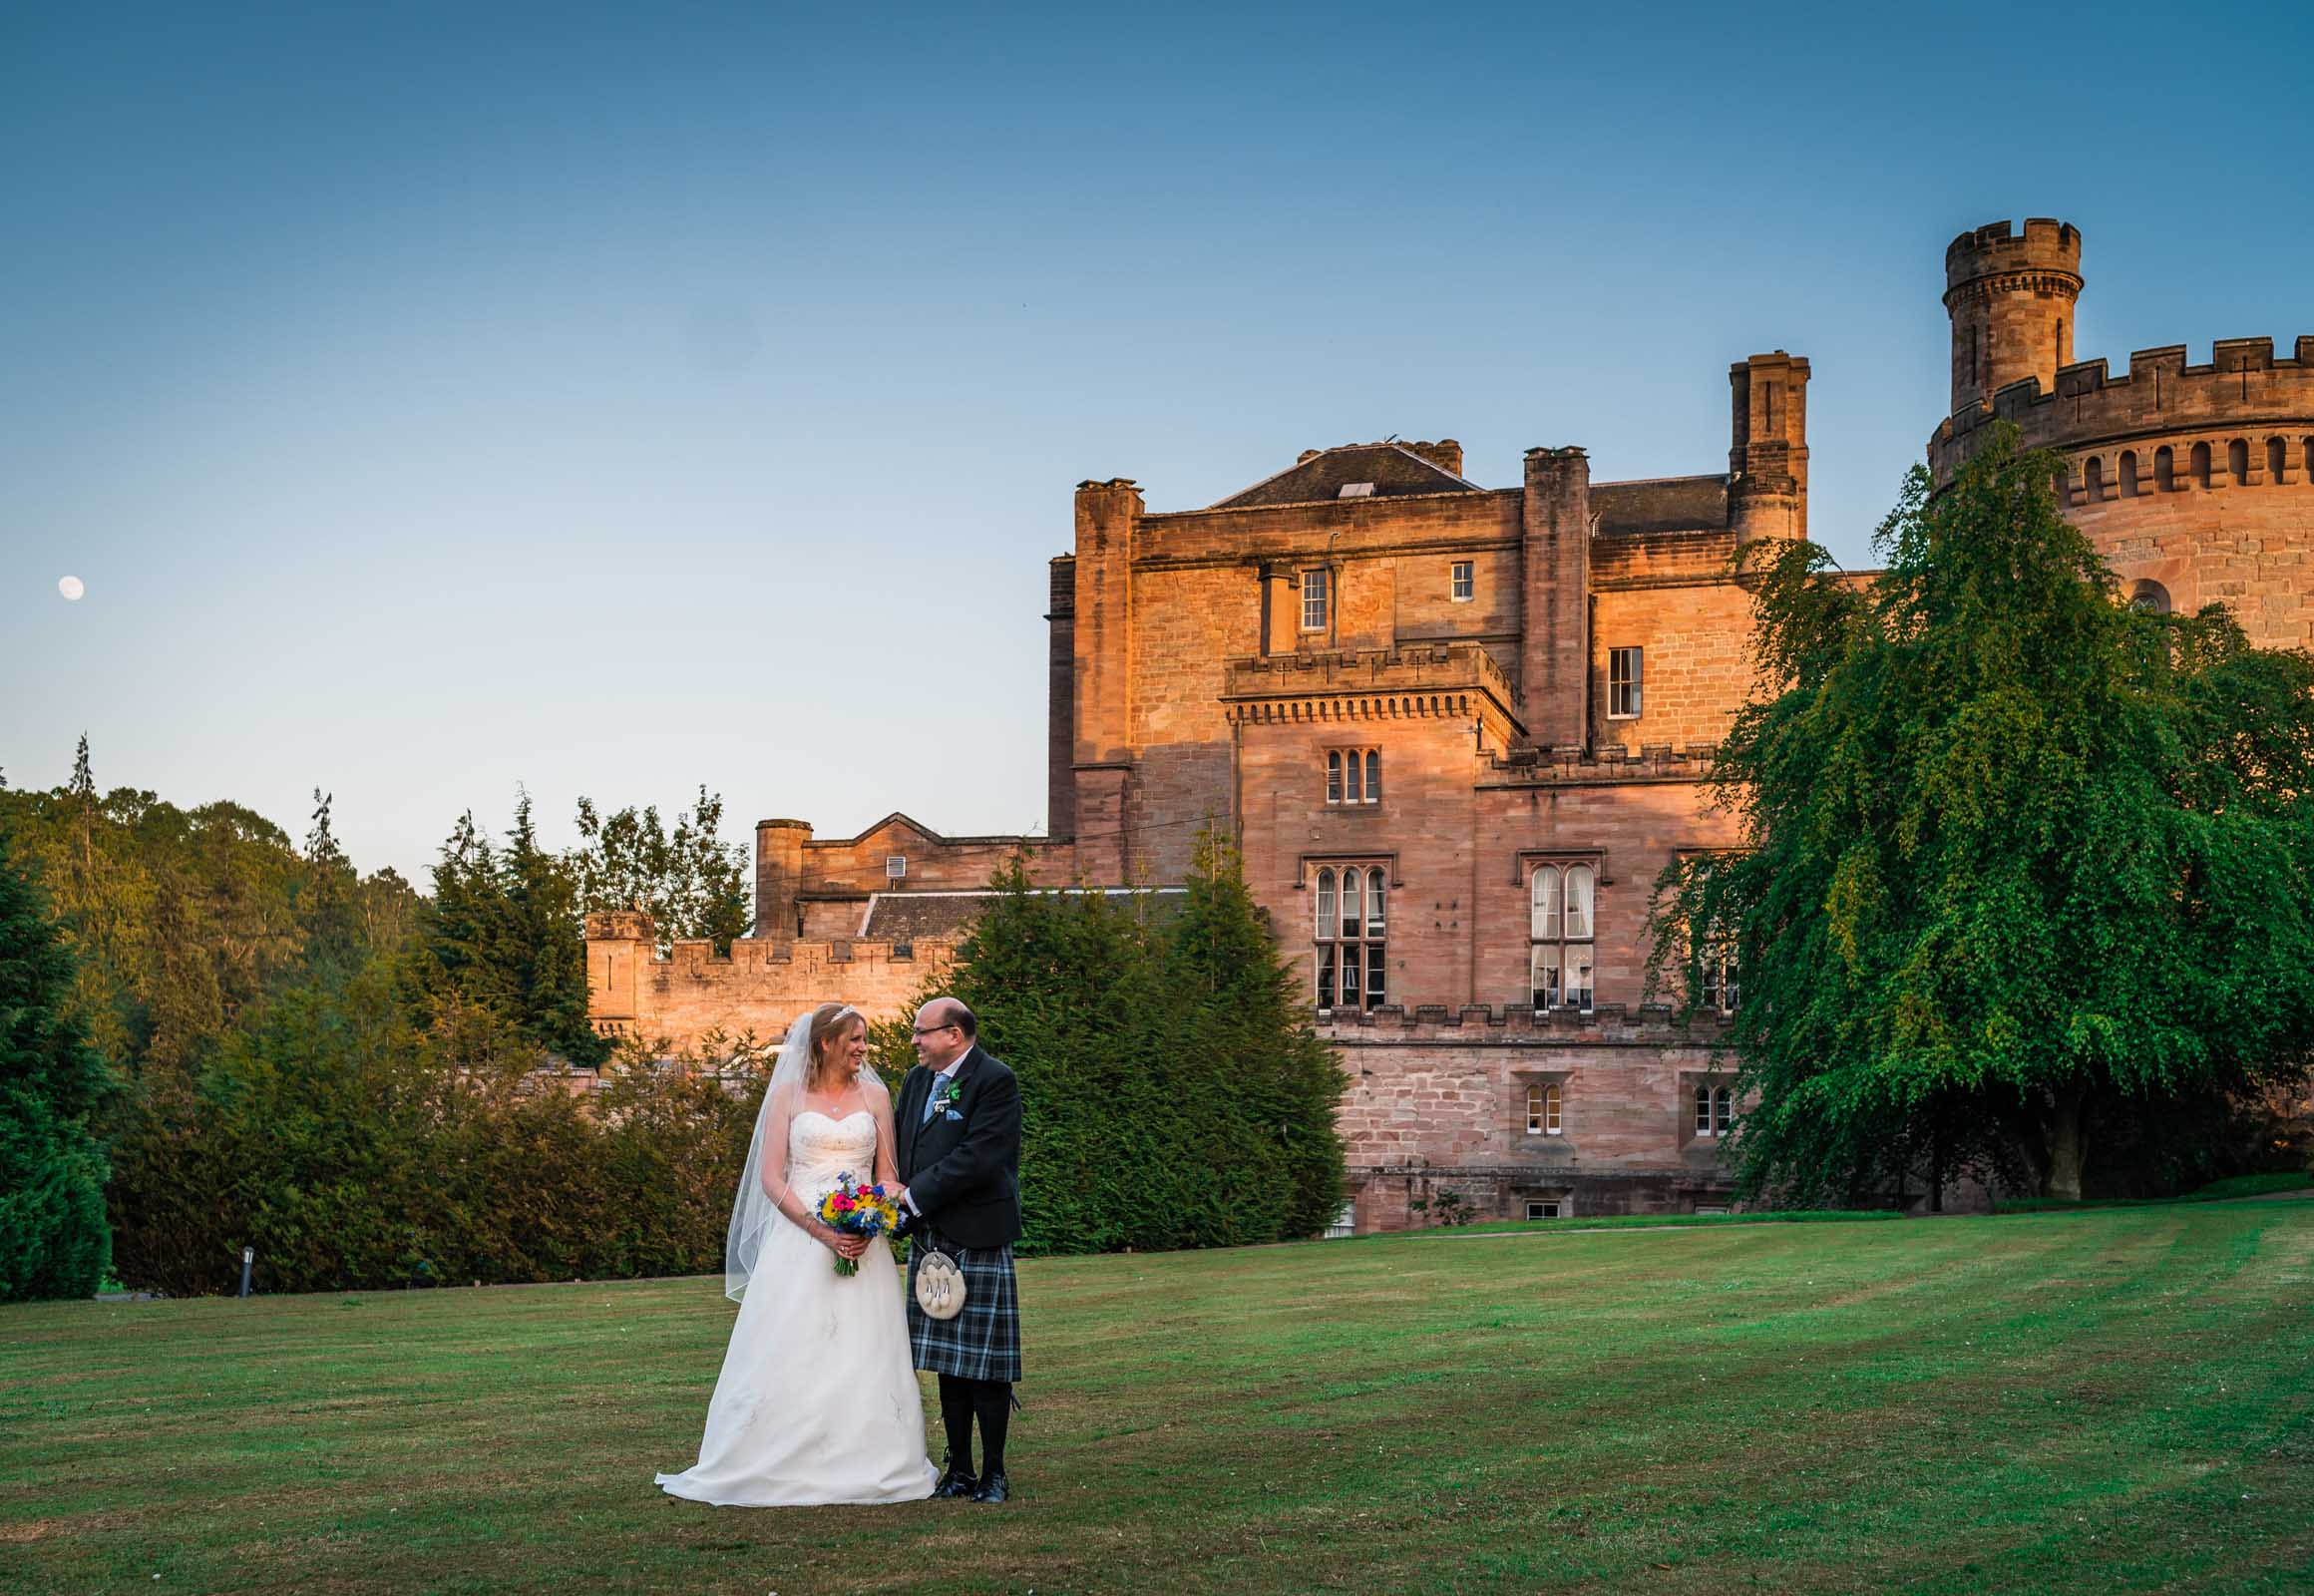 dalhousie-midlothian-wedding-dearlyphotography (8 of 10).jpg